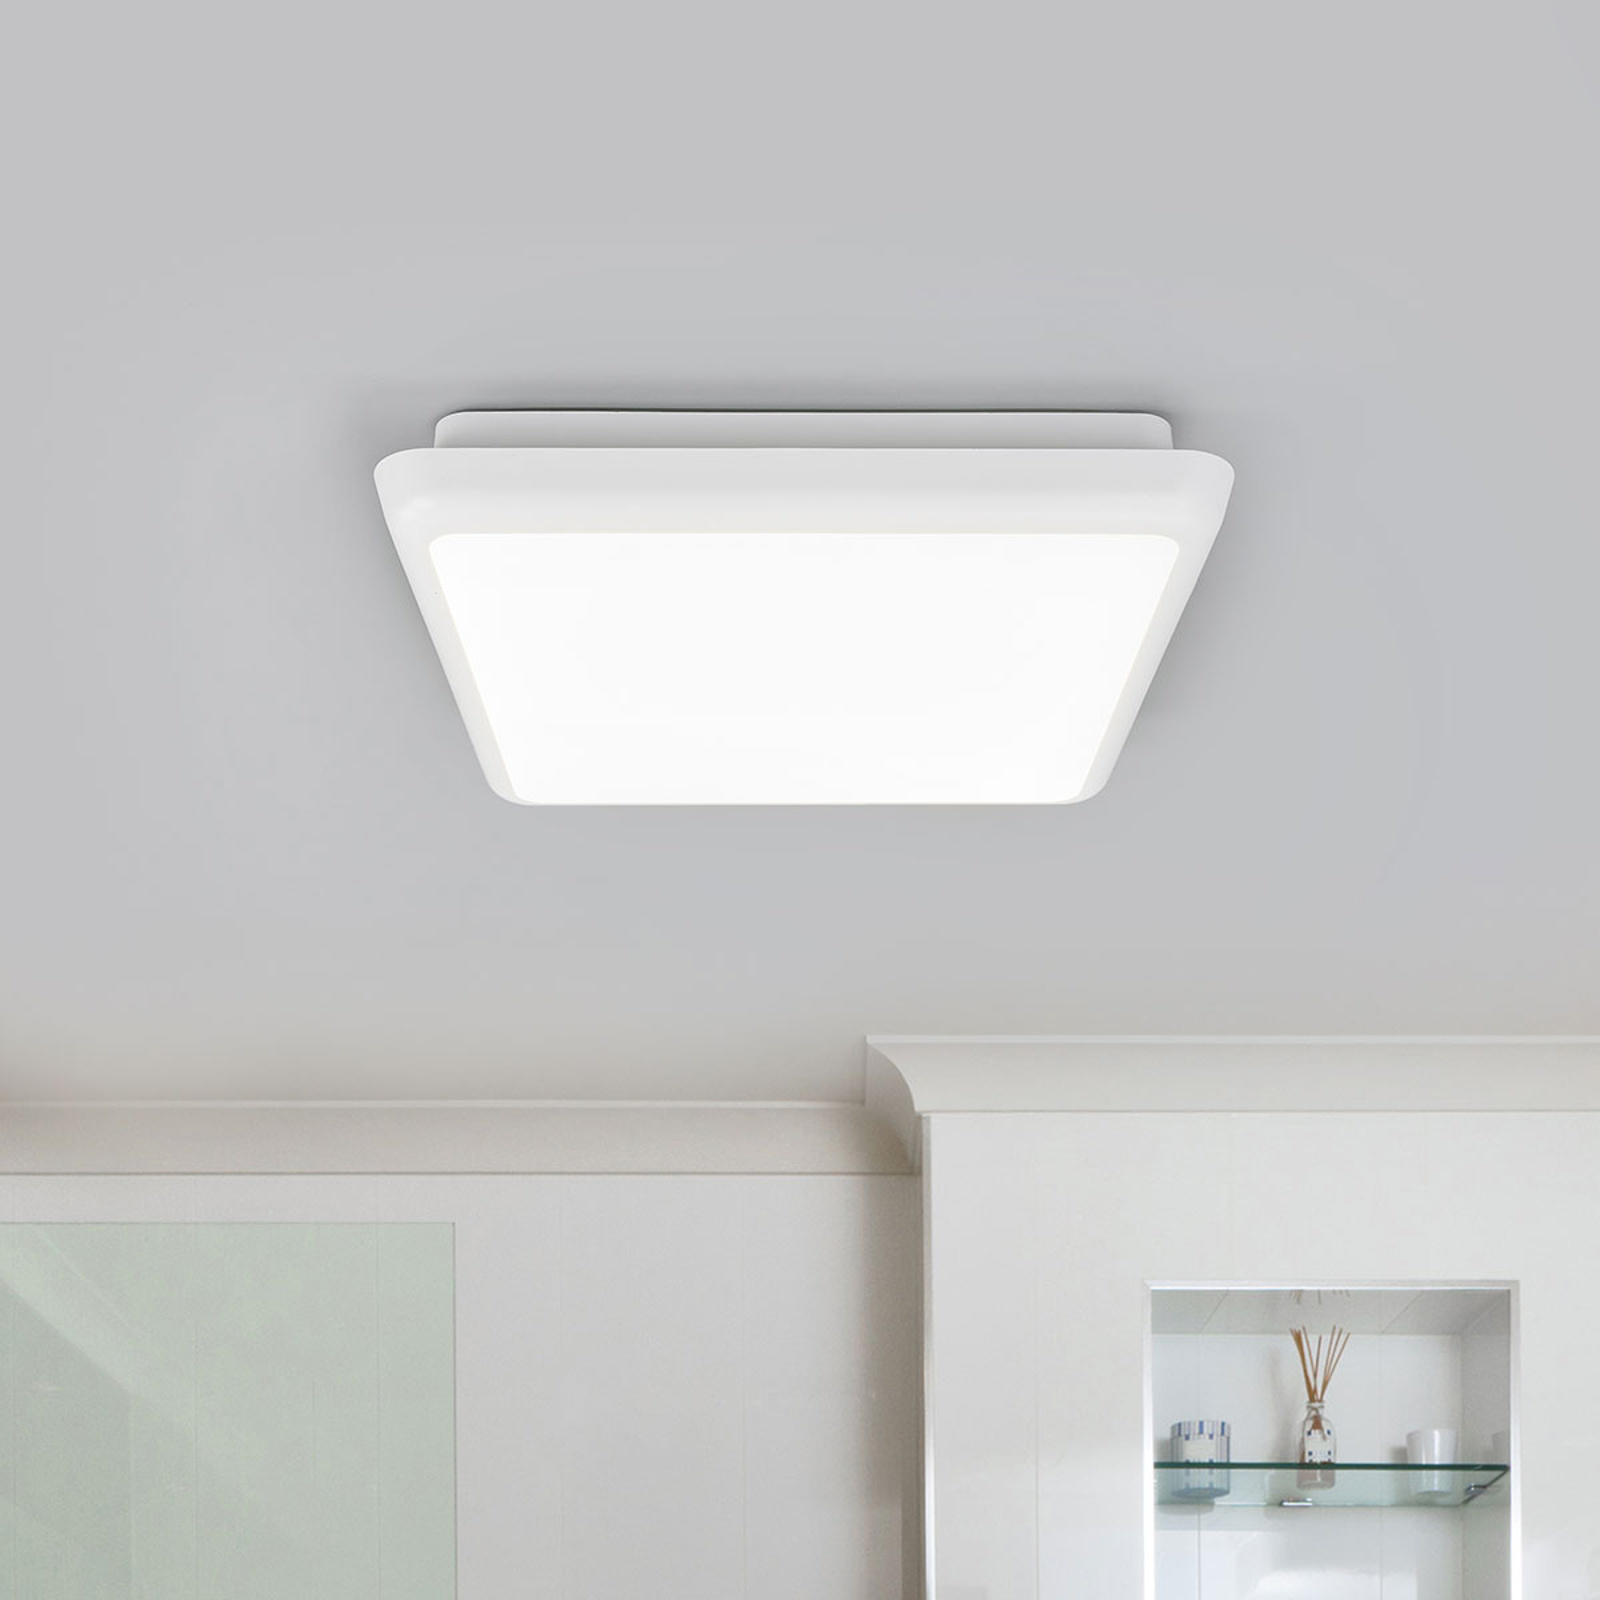 Kwadratowa lampa sufitowa LED Augustin, 25 cm